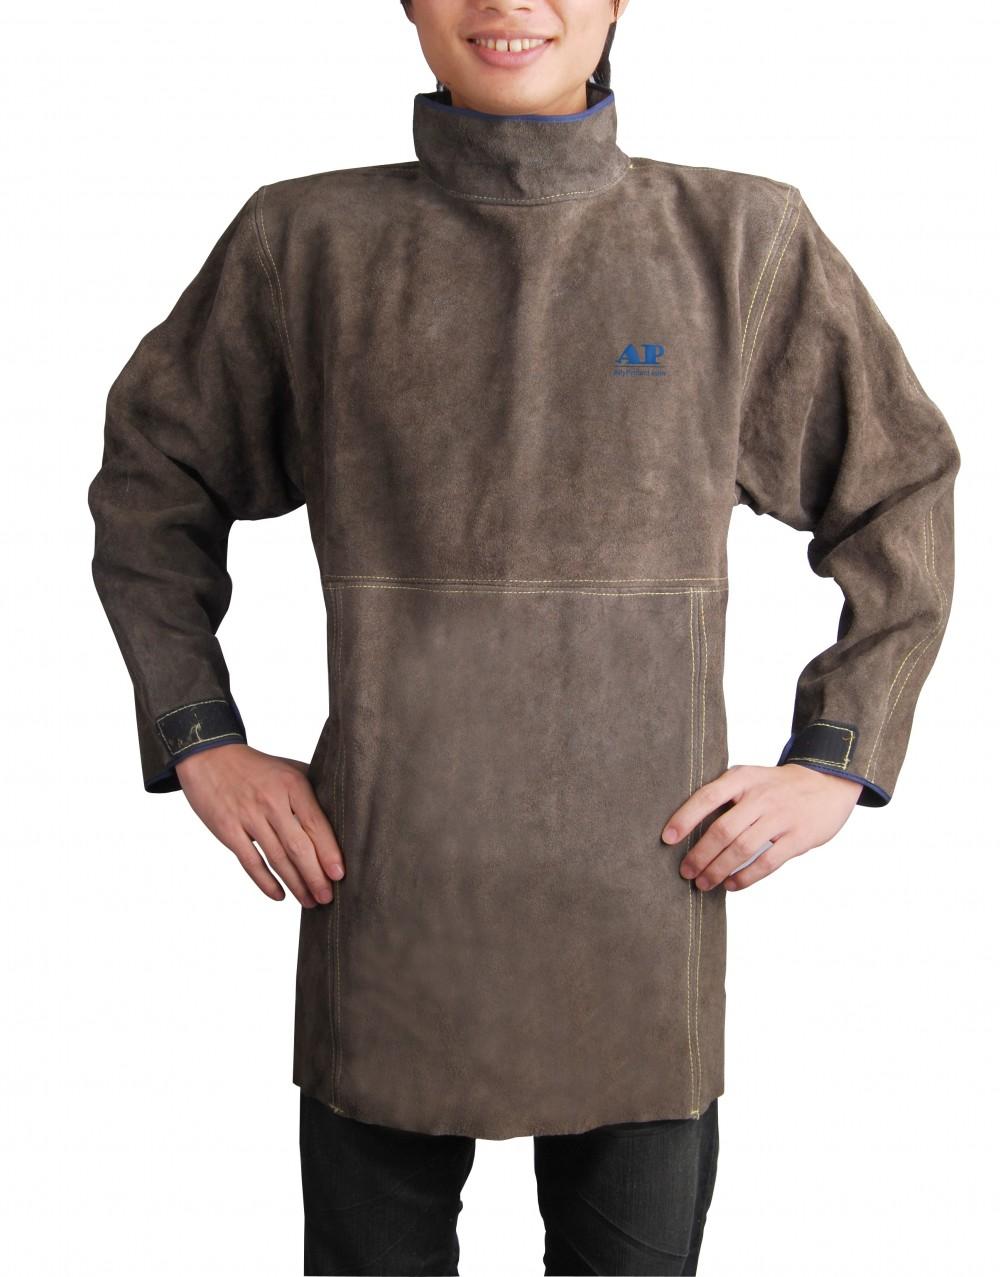 AP-8002友盟炭啡色皮护胸带领长袖围裙